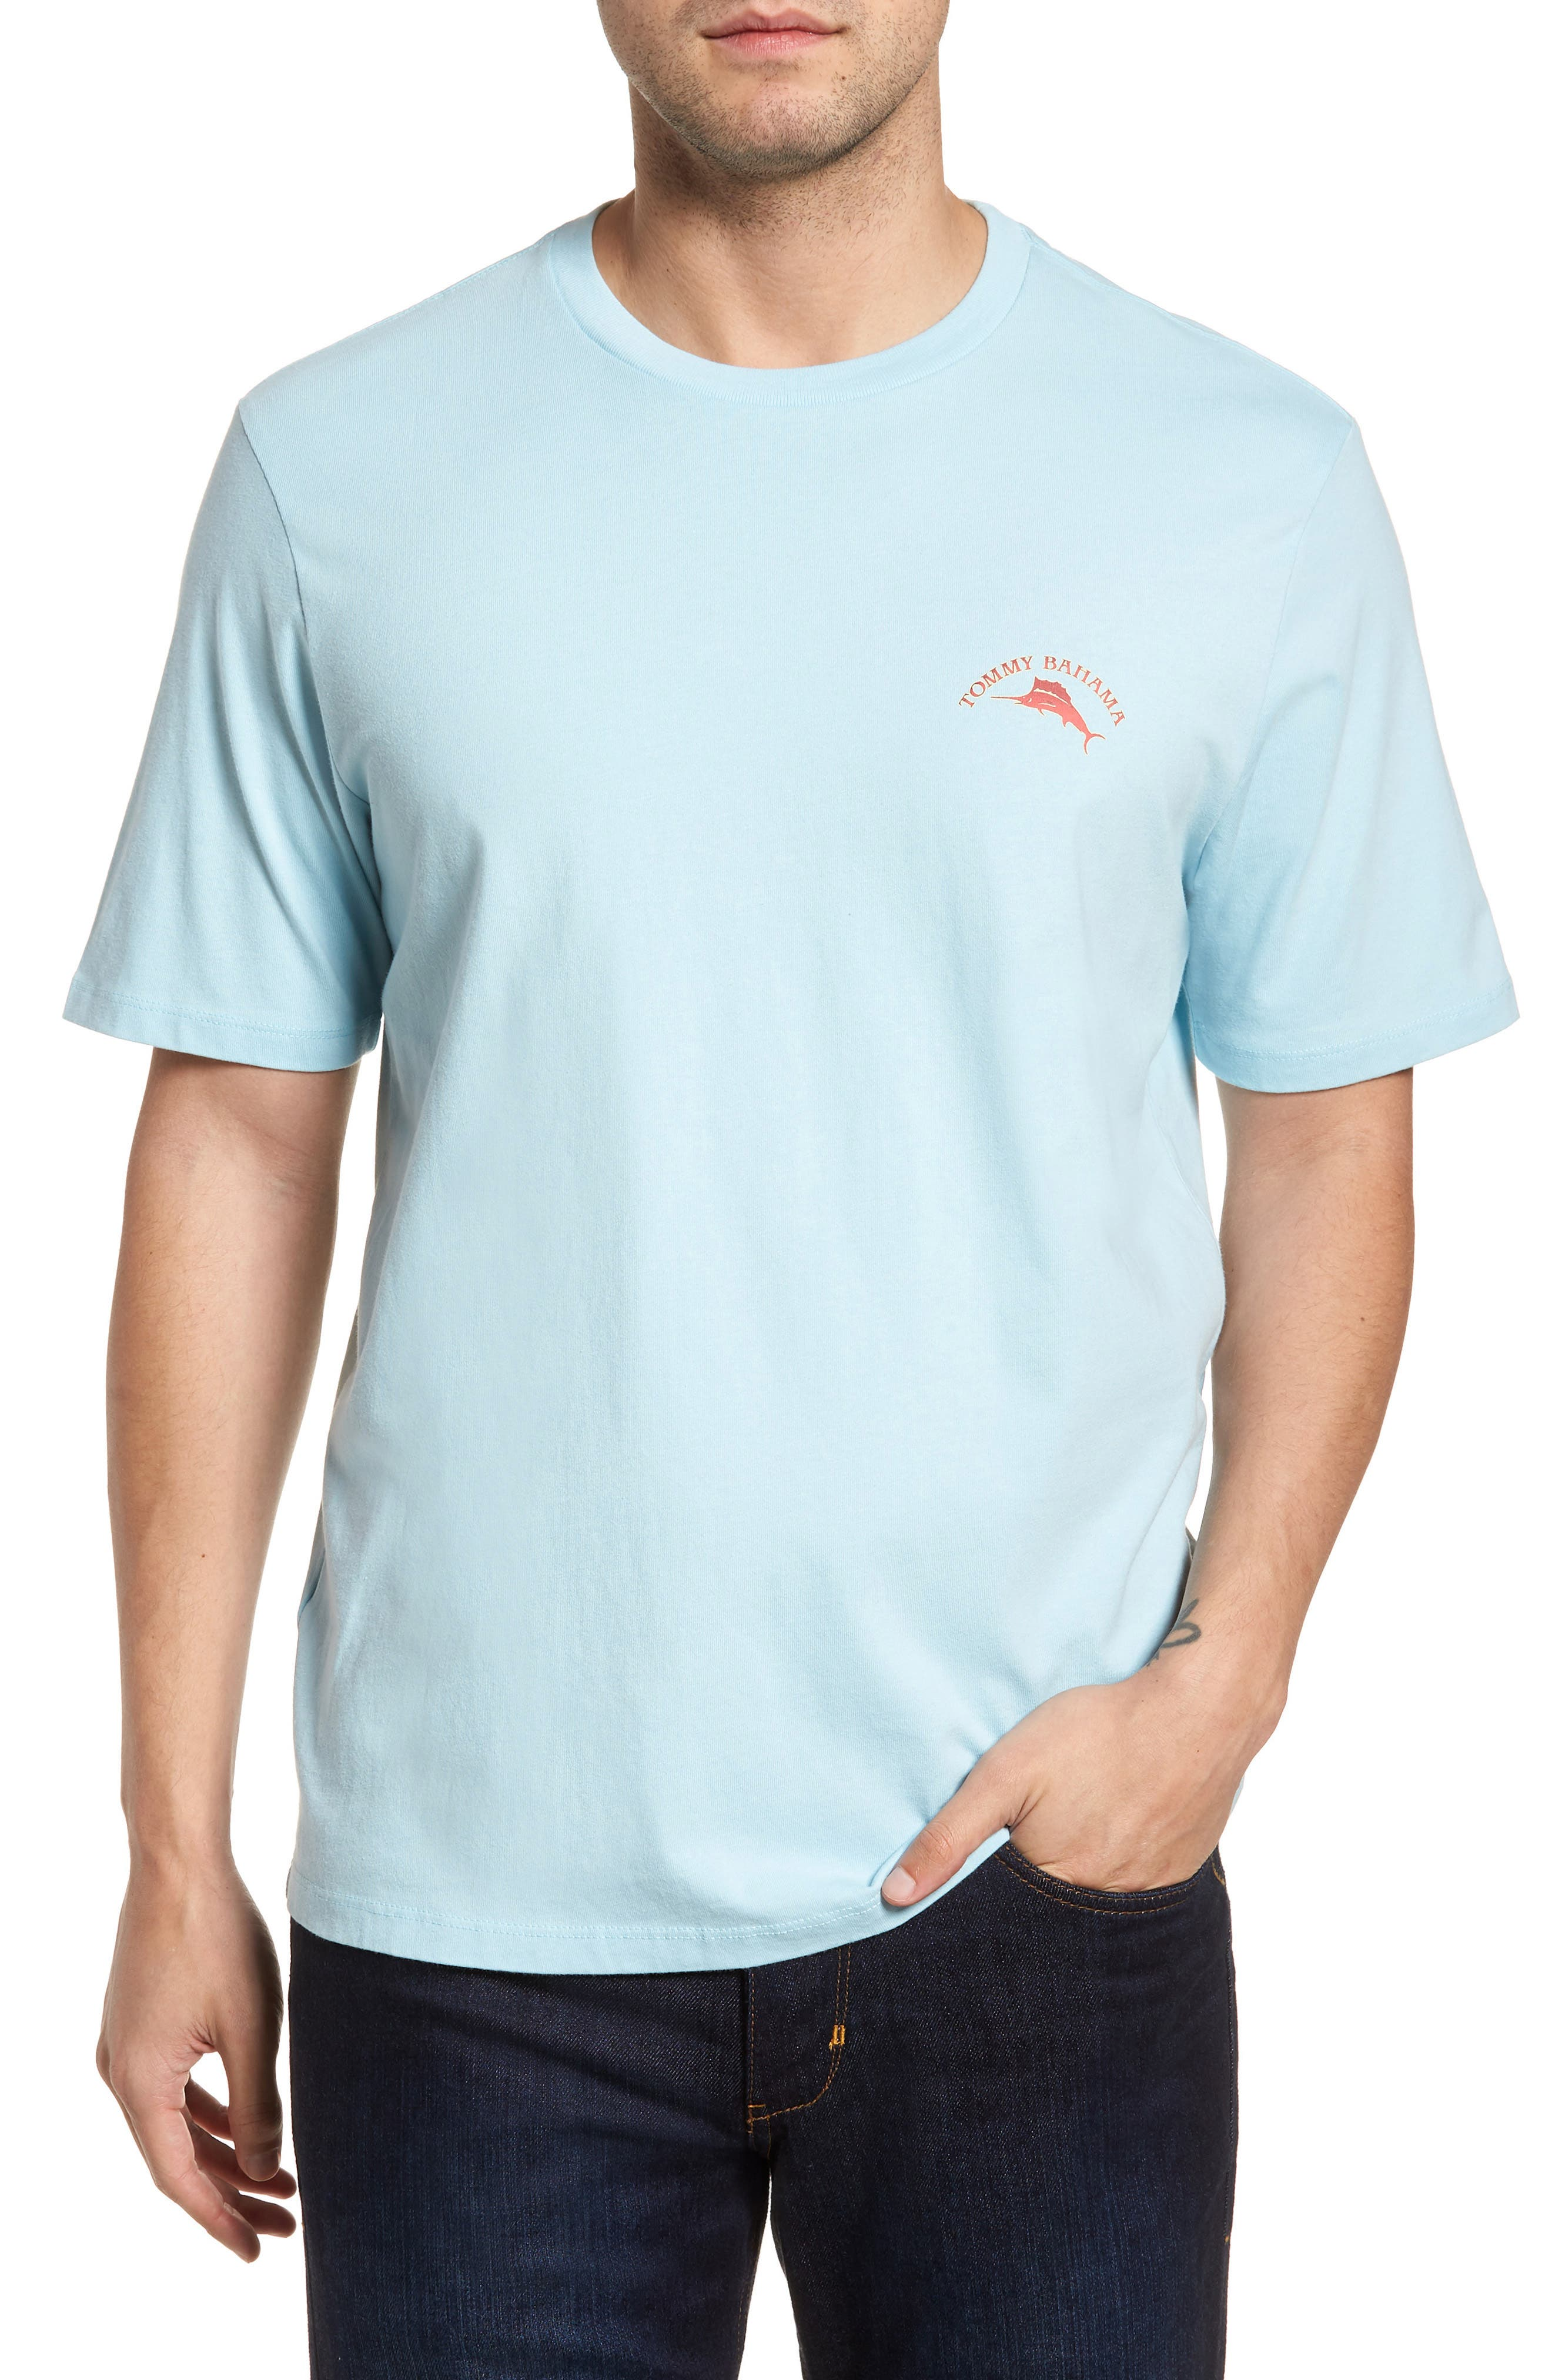 Zinspiration T-Shirt,                             Main thumbnail 1, color,                             100